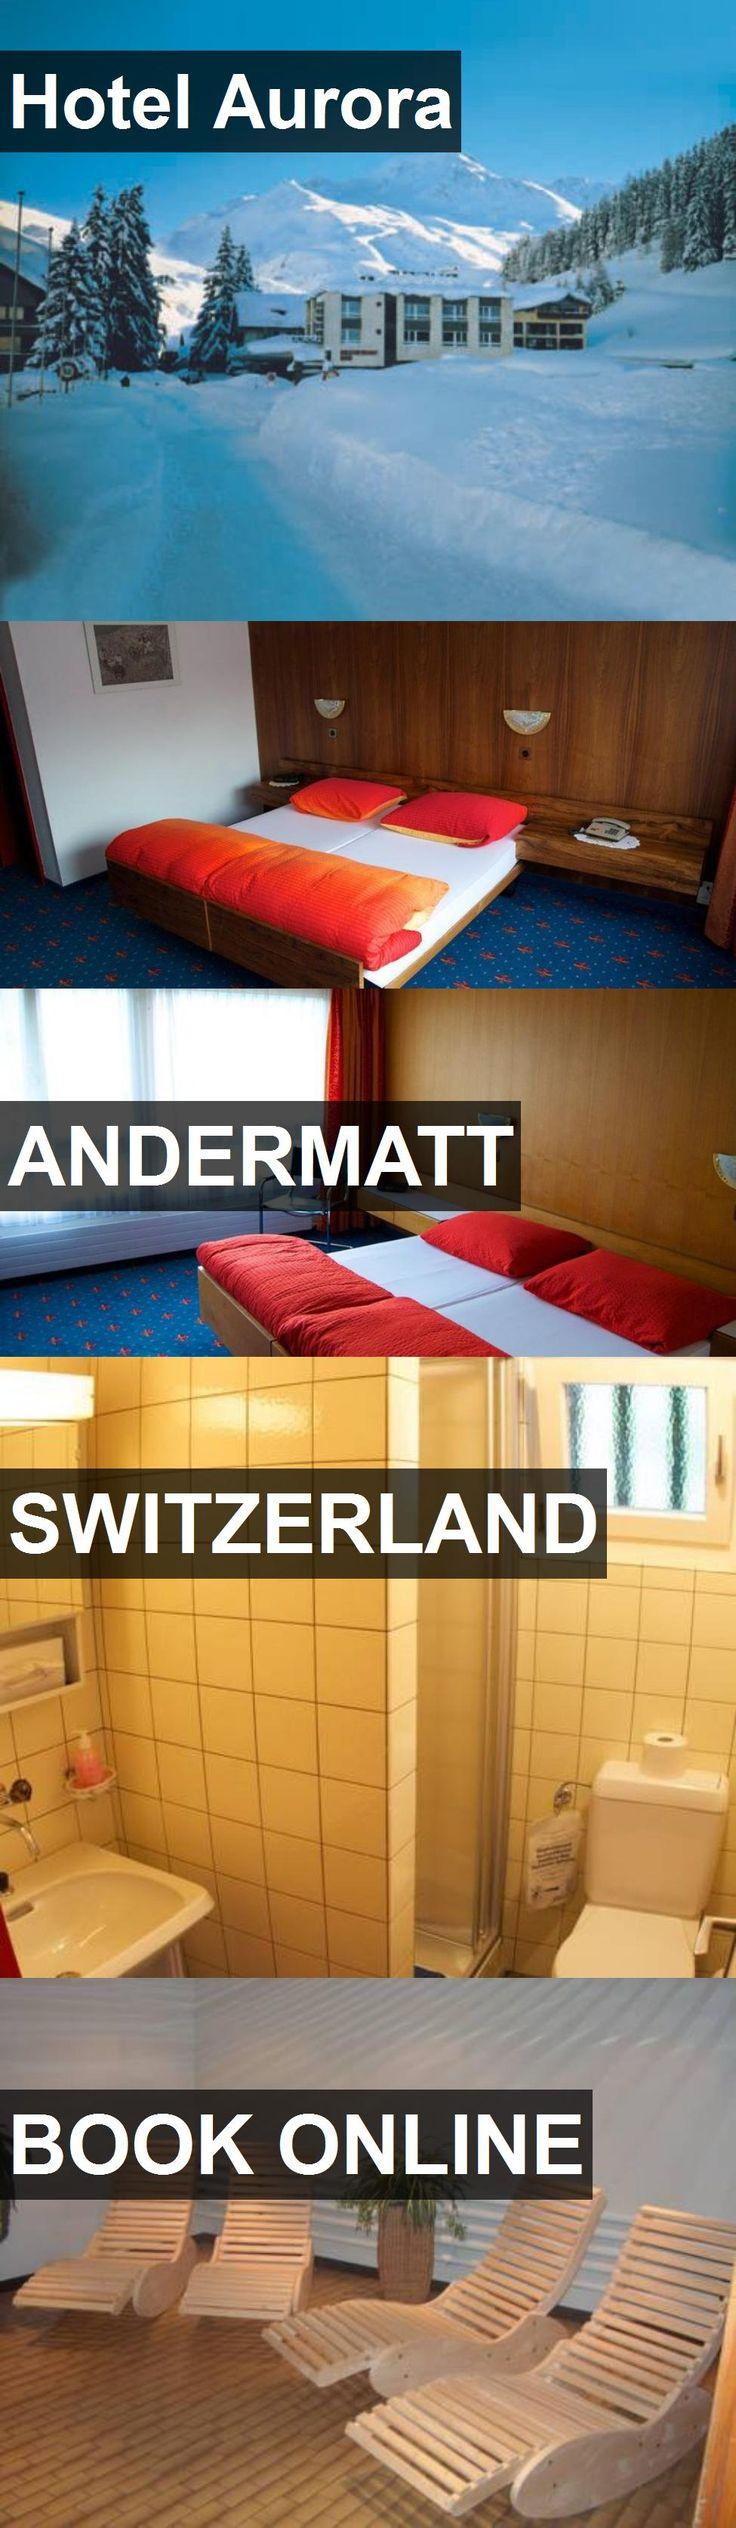 Hotel Aurora in Andermatt, Switzerland. For more information, photos, reviews and best prices please follow the link. #Switzerland #Andermatt #travel #vacation #hotel